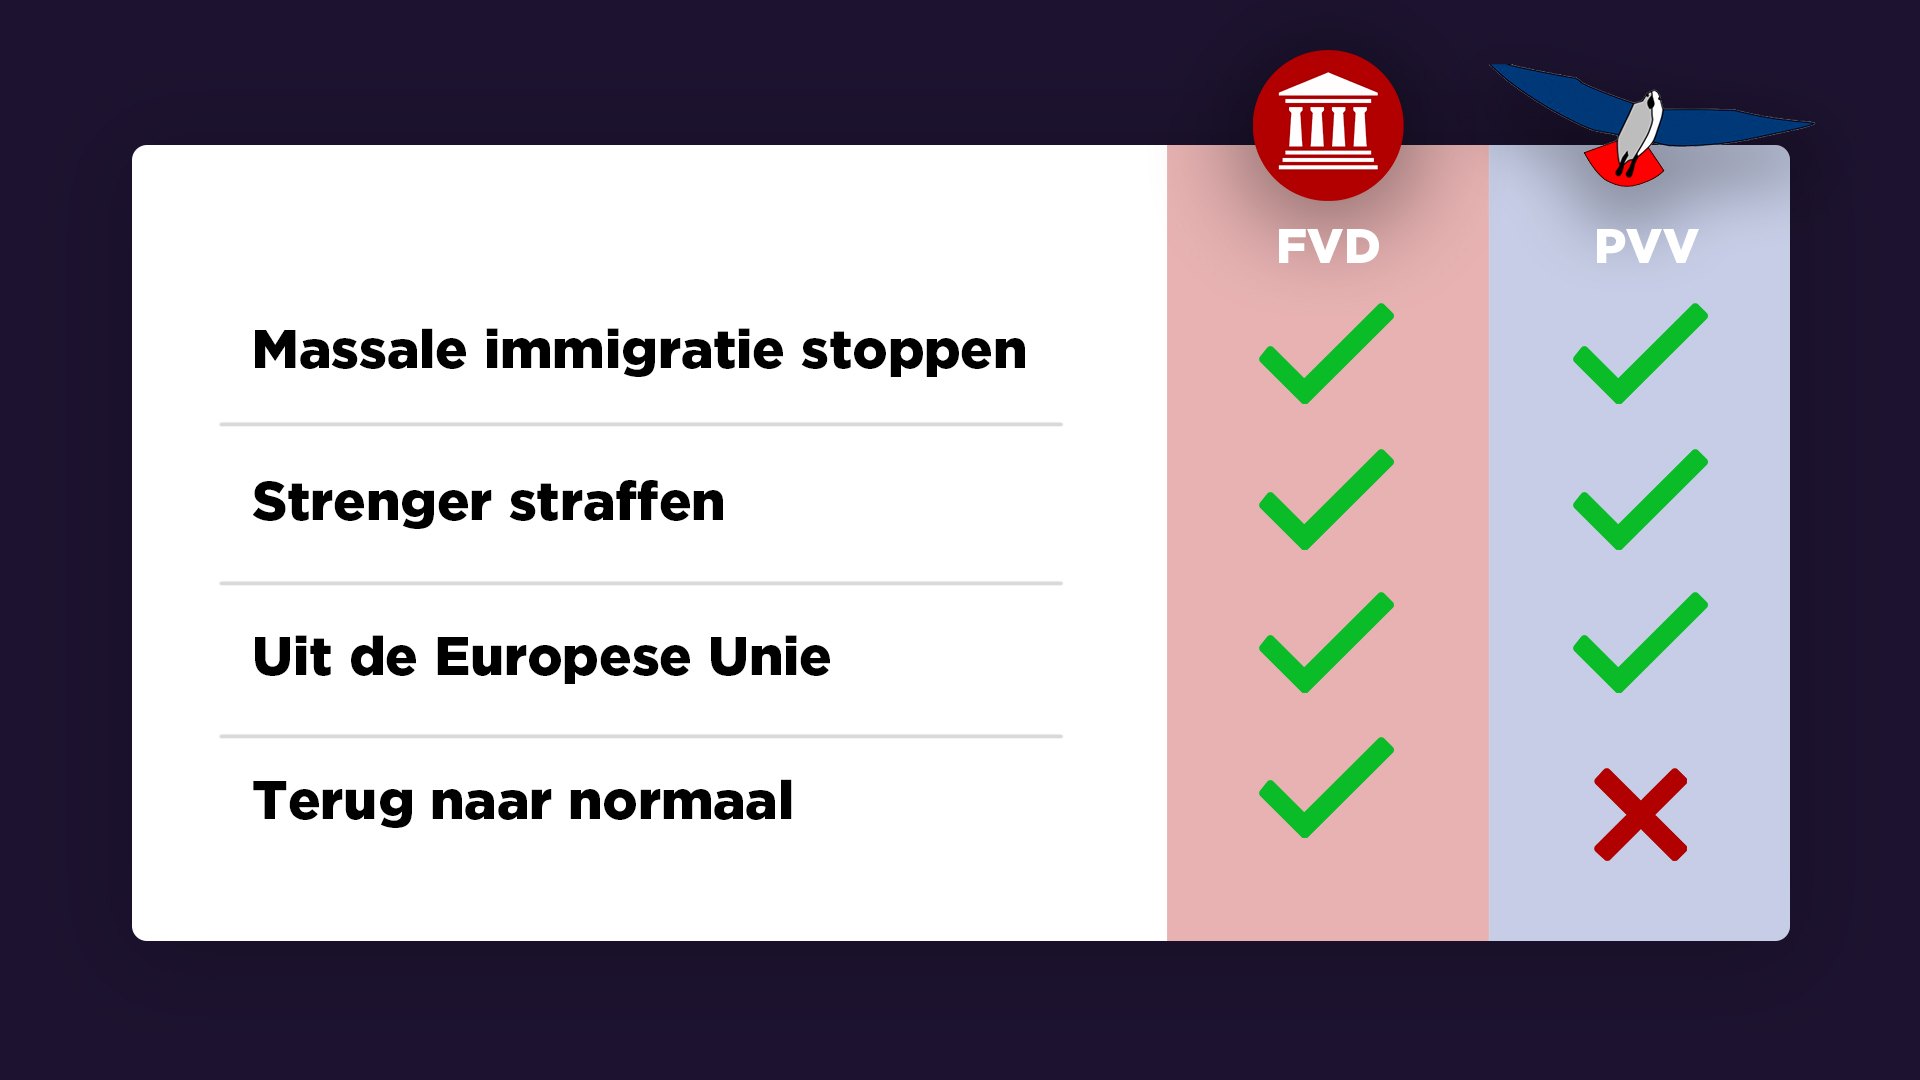 Forum vs PVV